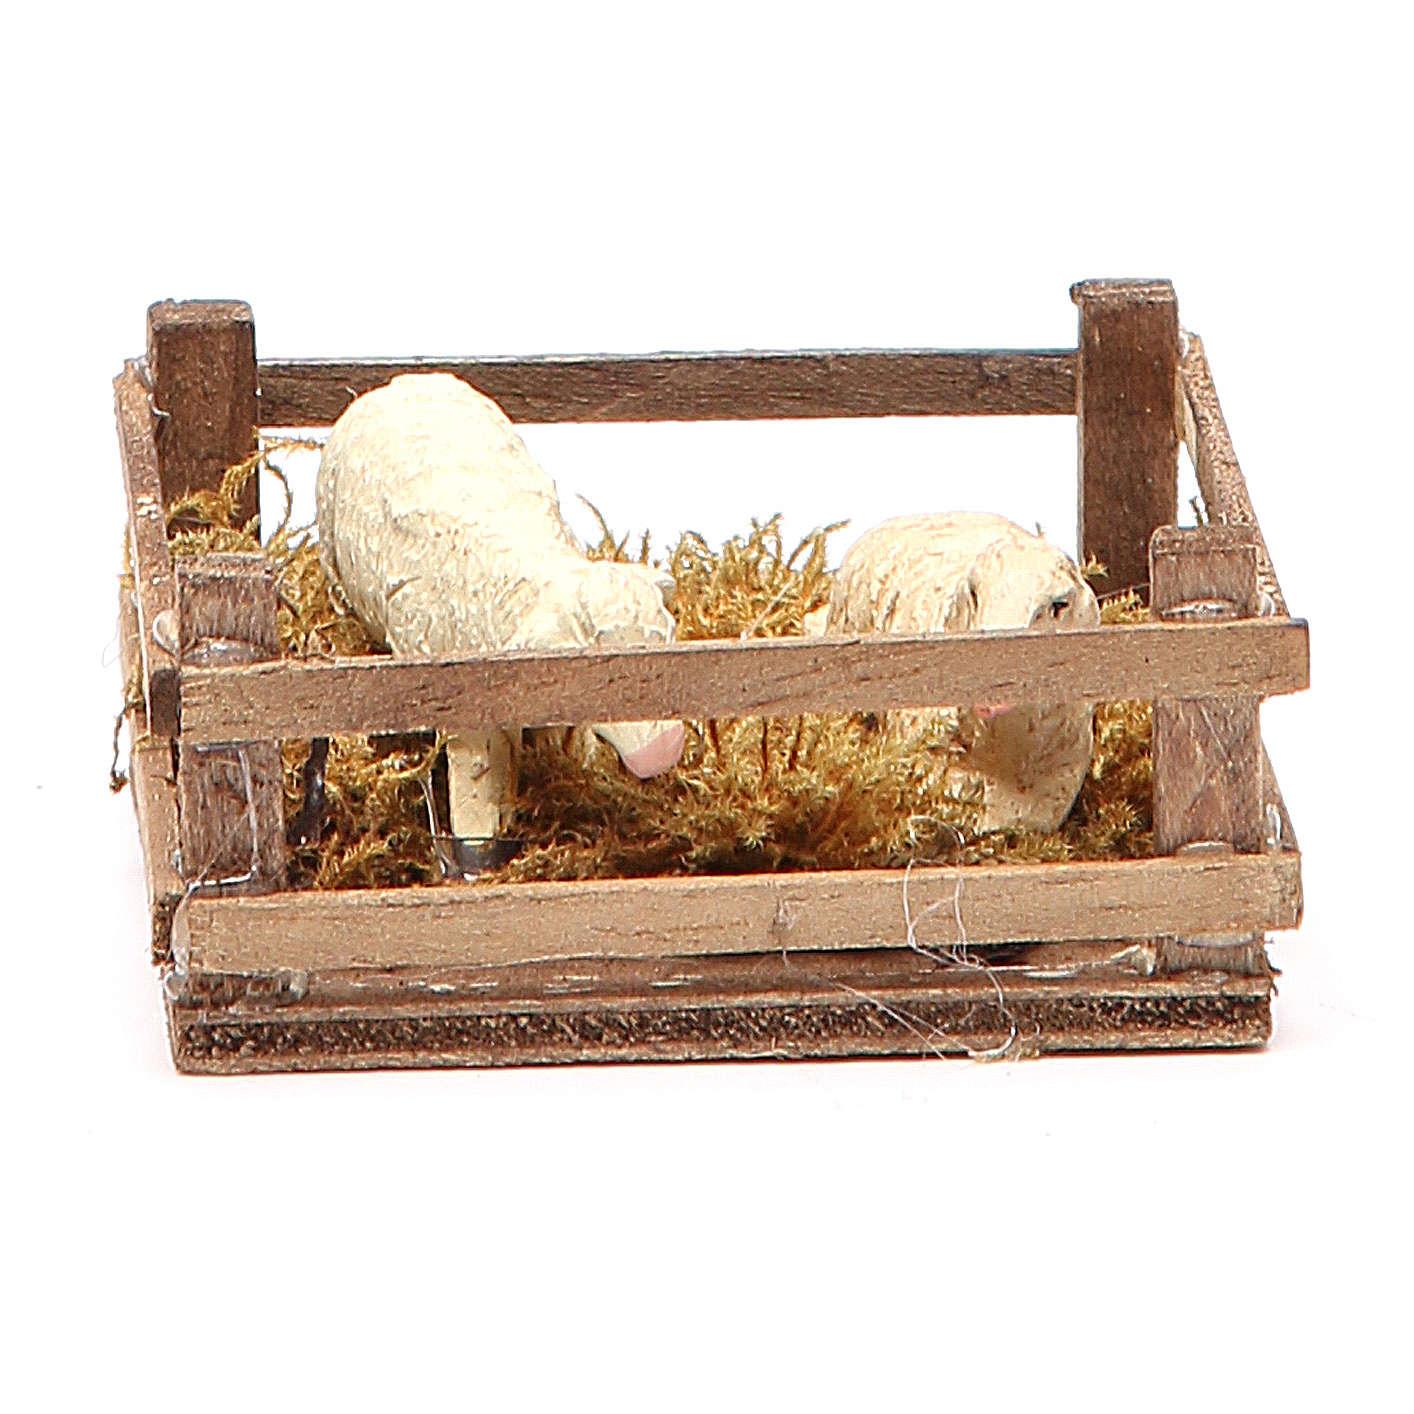 Corral with Sheeps 3x6,5x6,5 neapolitan Nativity 4